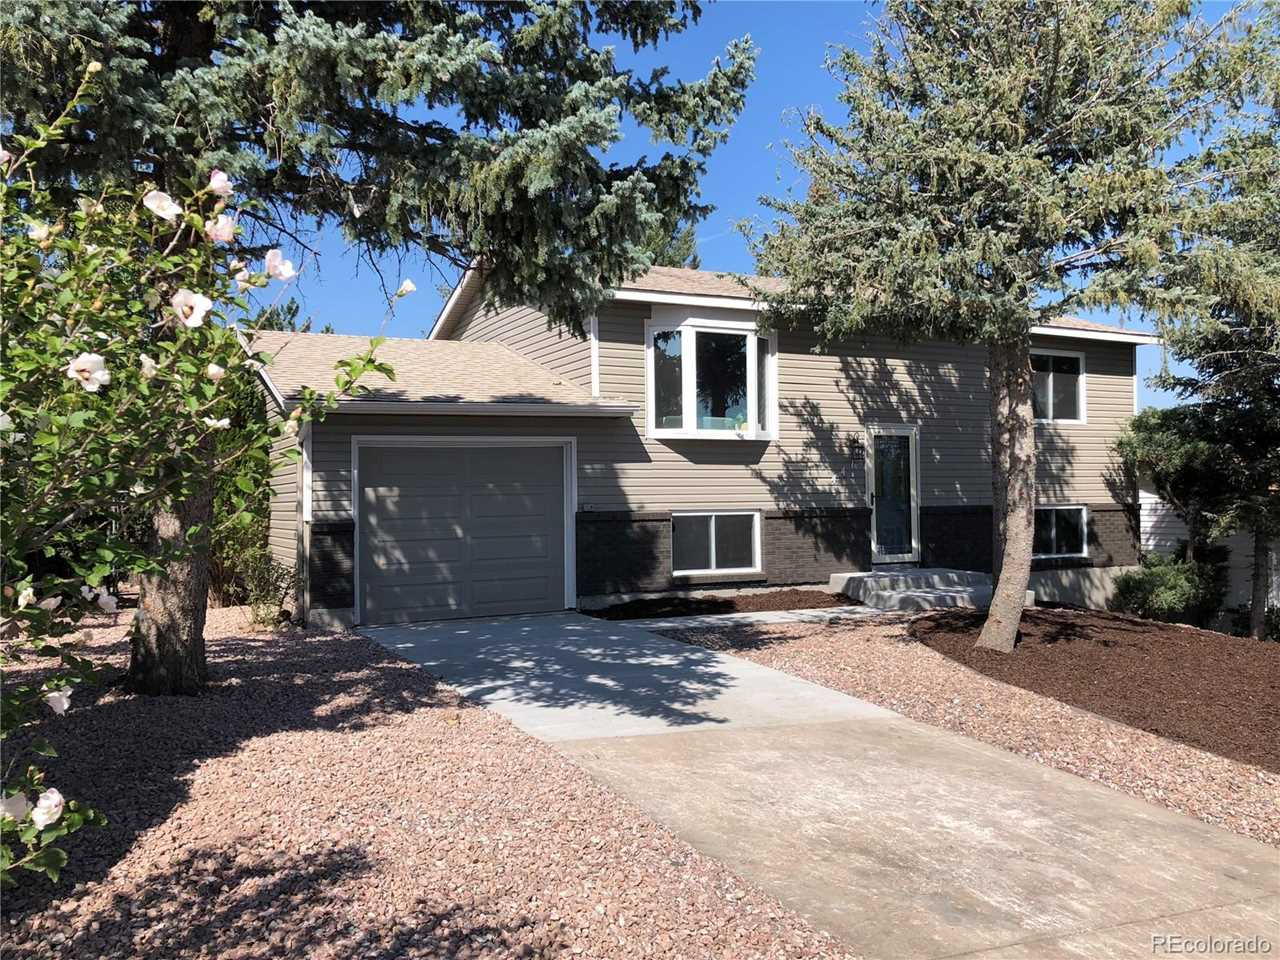 4412 South Chamberlin Colorado Springs Co 80906 Mls 5334055